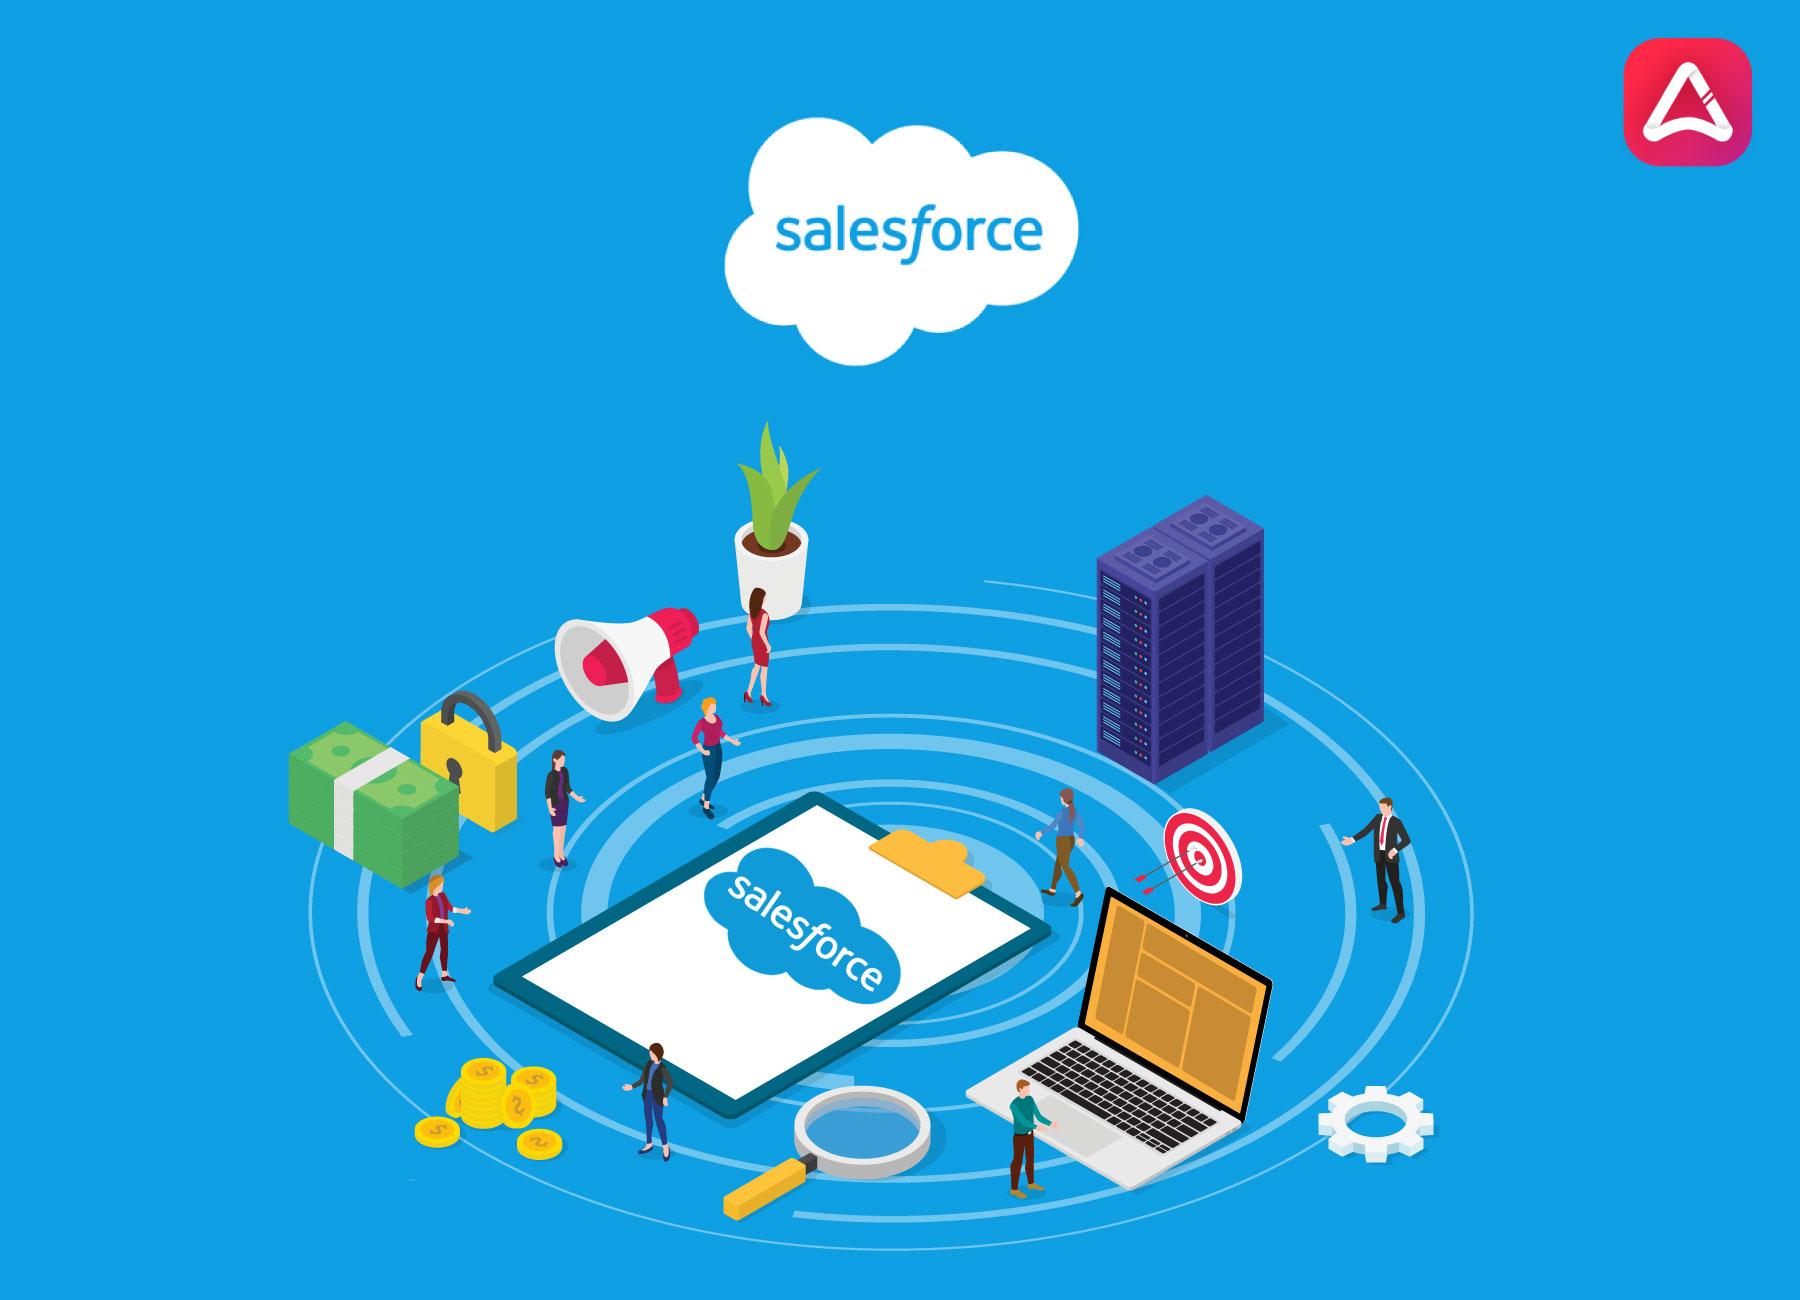 Salesforce Application